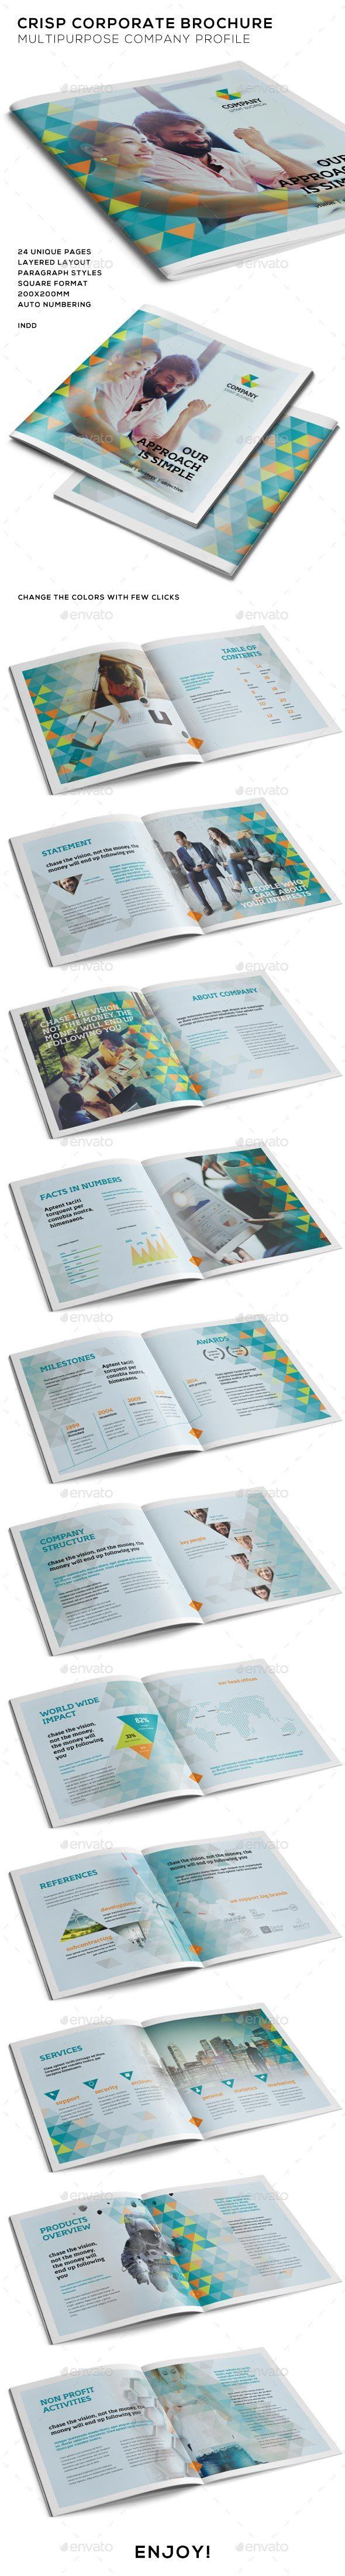 Corporate Brochure - Multipurpose - Corporate Brochures